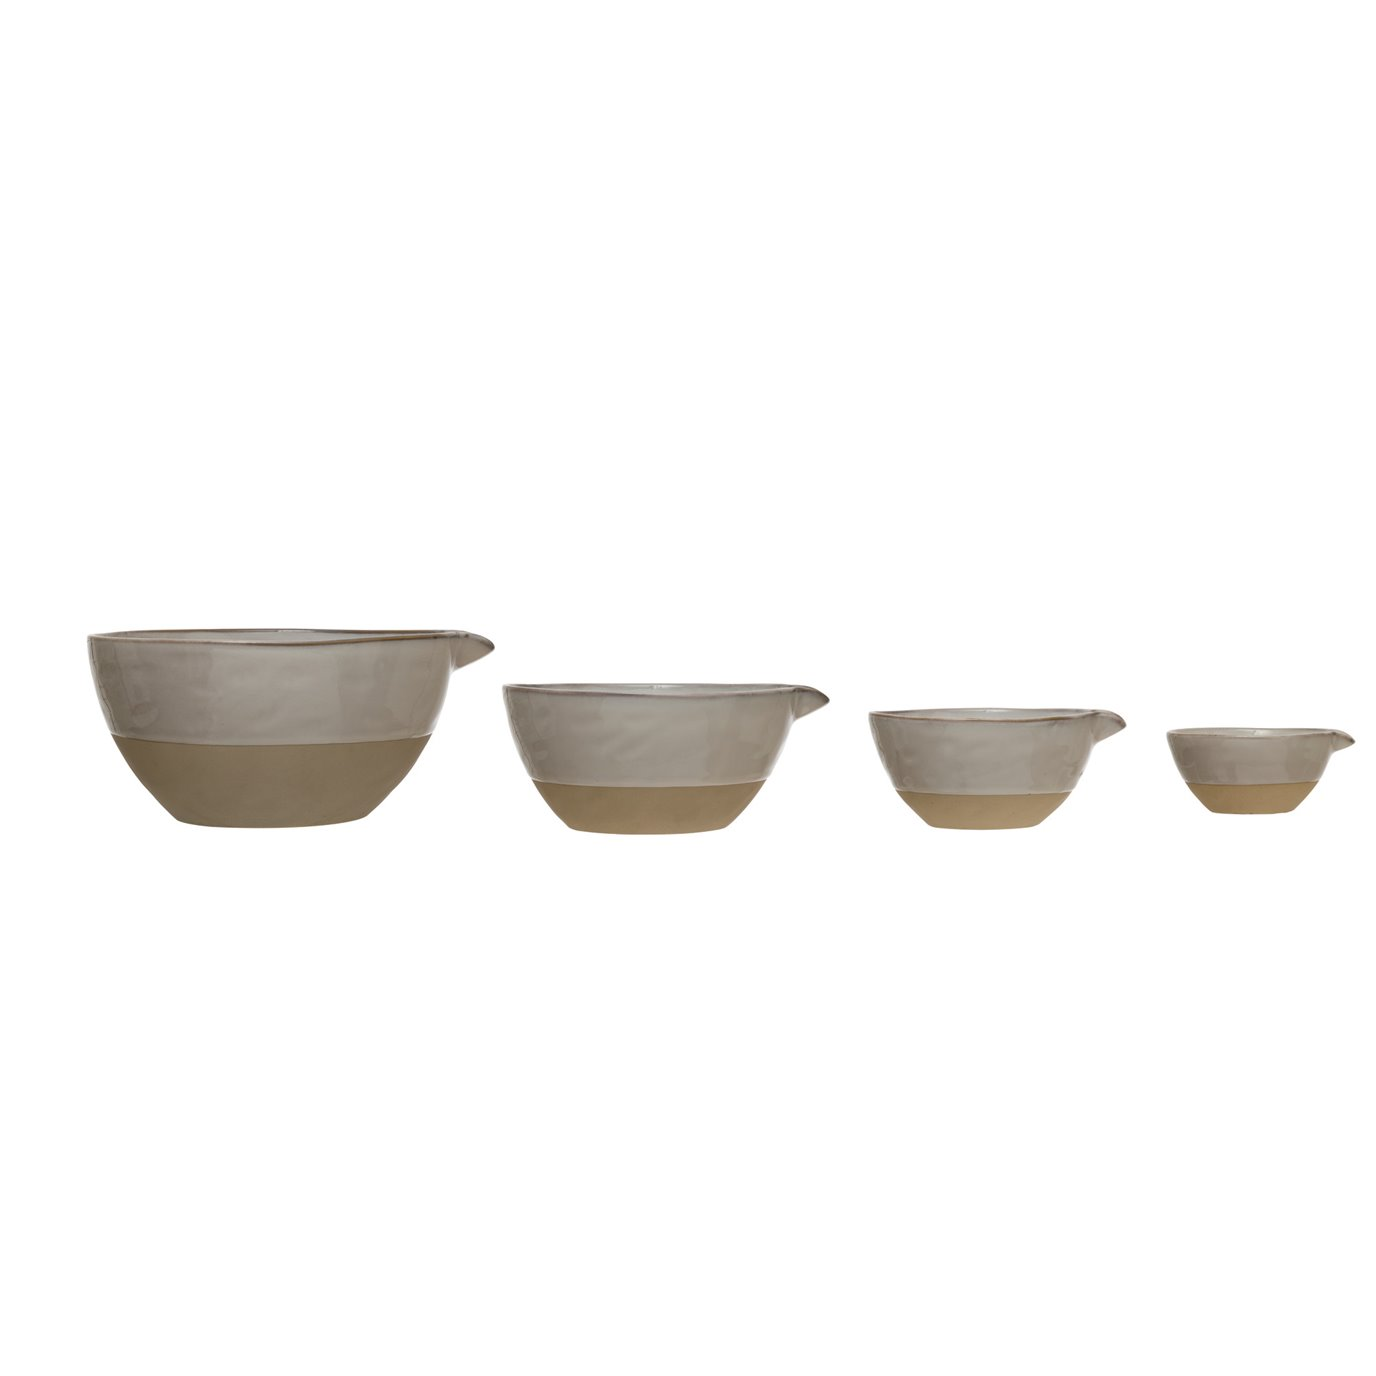 Stoneware White Batter Bowls (Set of 4)